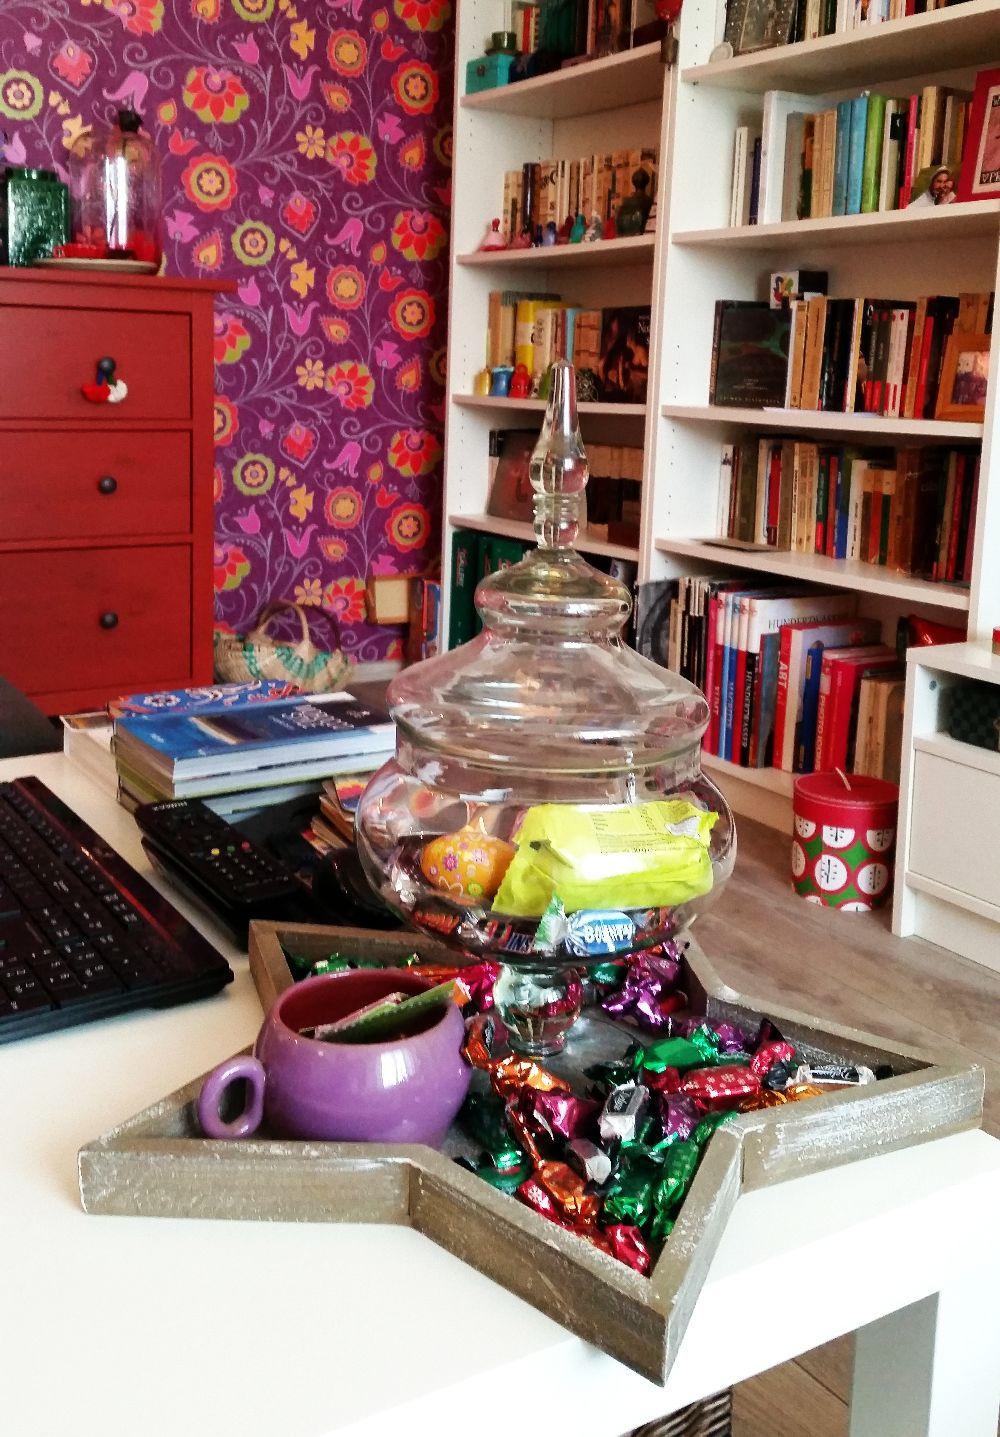 adelaparvu.com despre apartament 3 camere colorat in Sibiu, Foto Adela Parvu (52)